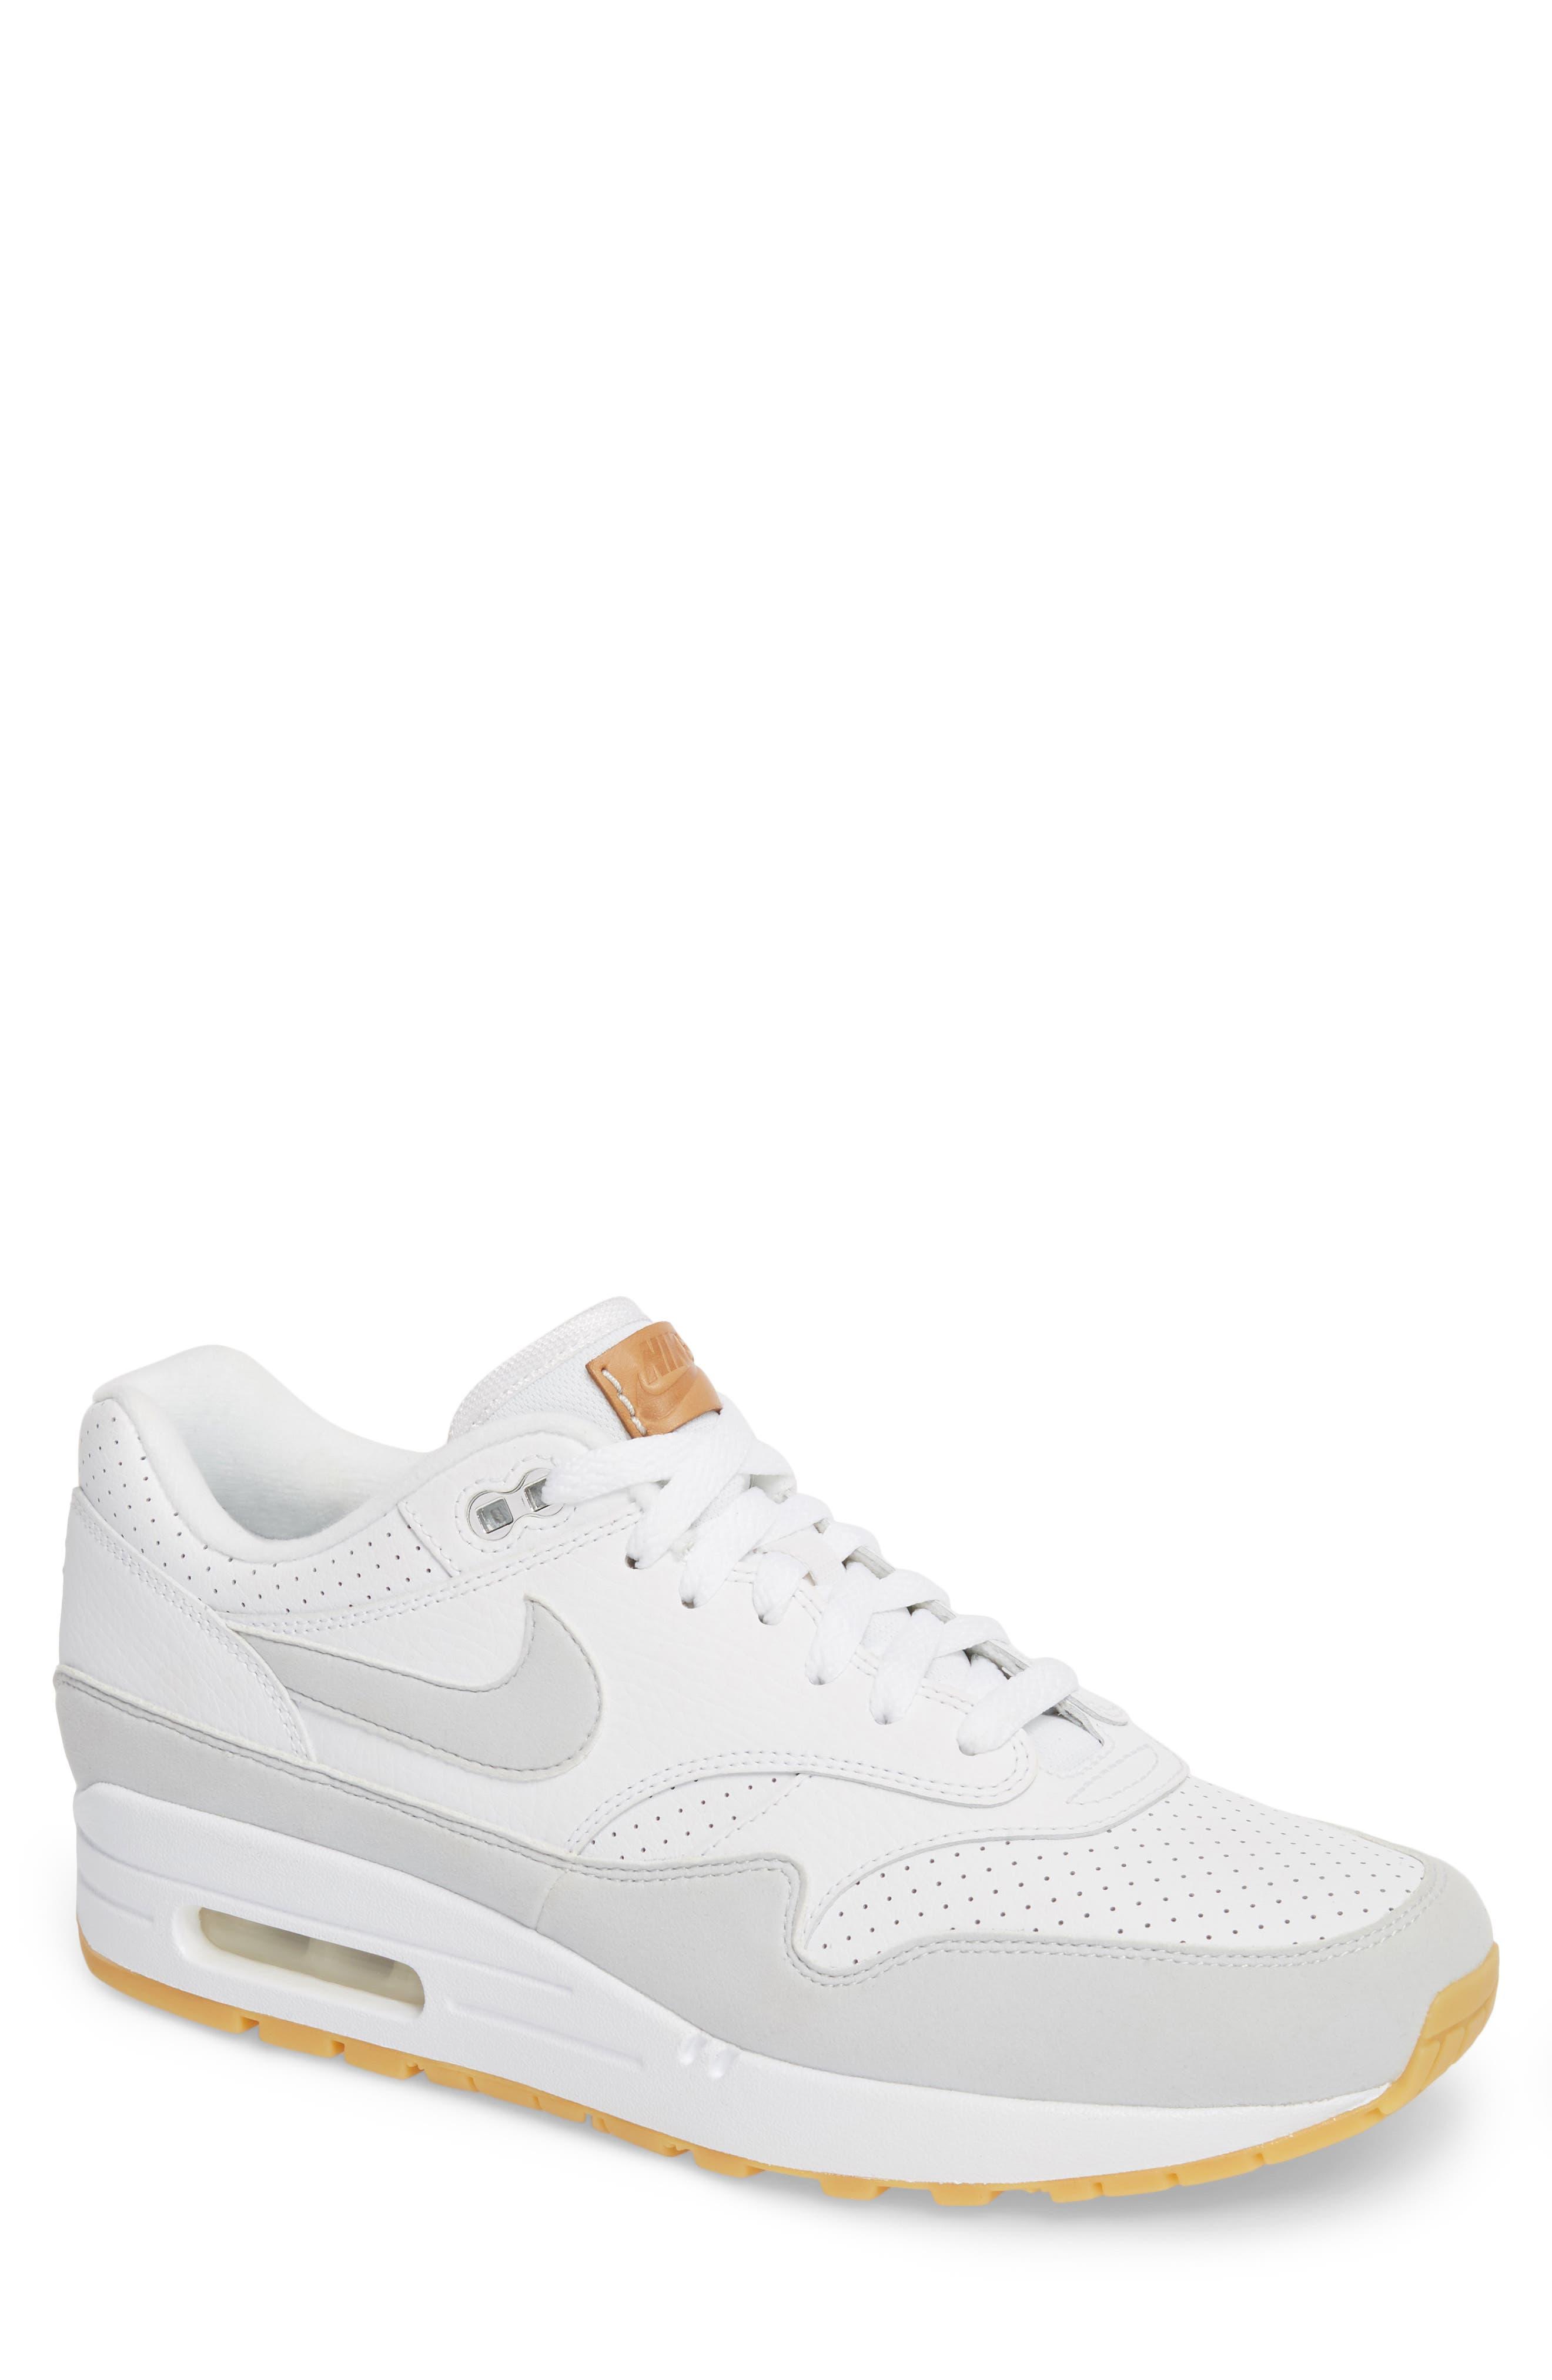 Air Max 1 Sneaker,                             Main thumbnail 1, color,                             White/ Pure Platinum/ Yellow